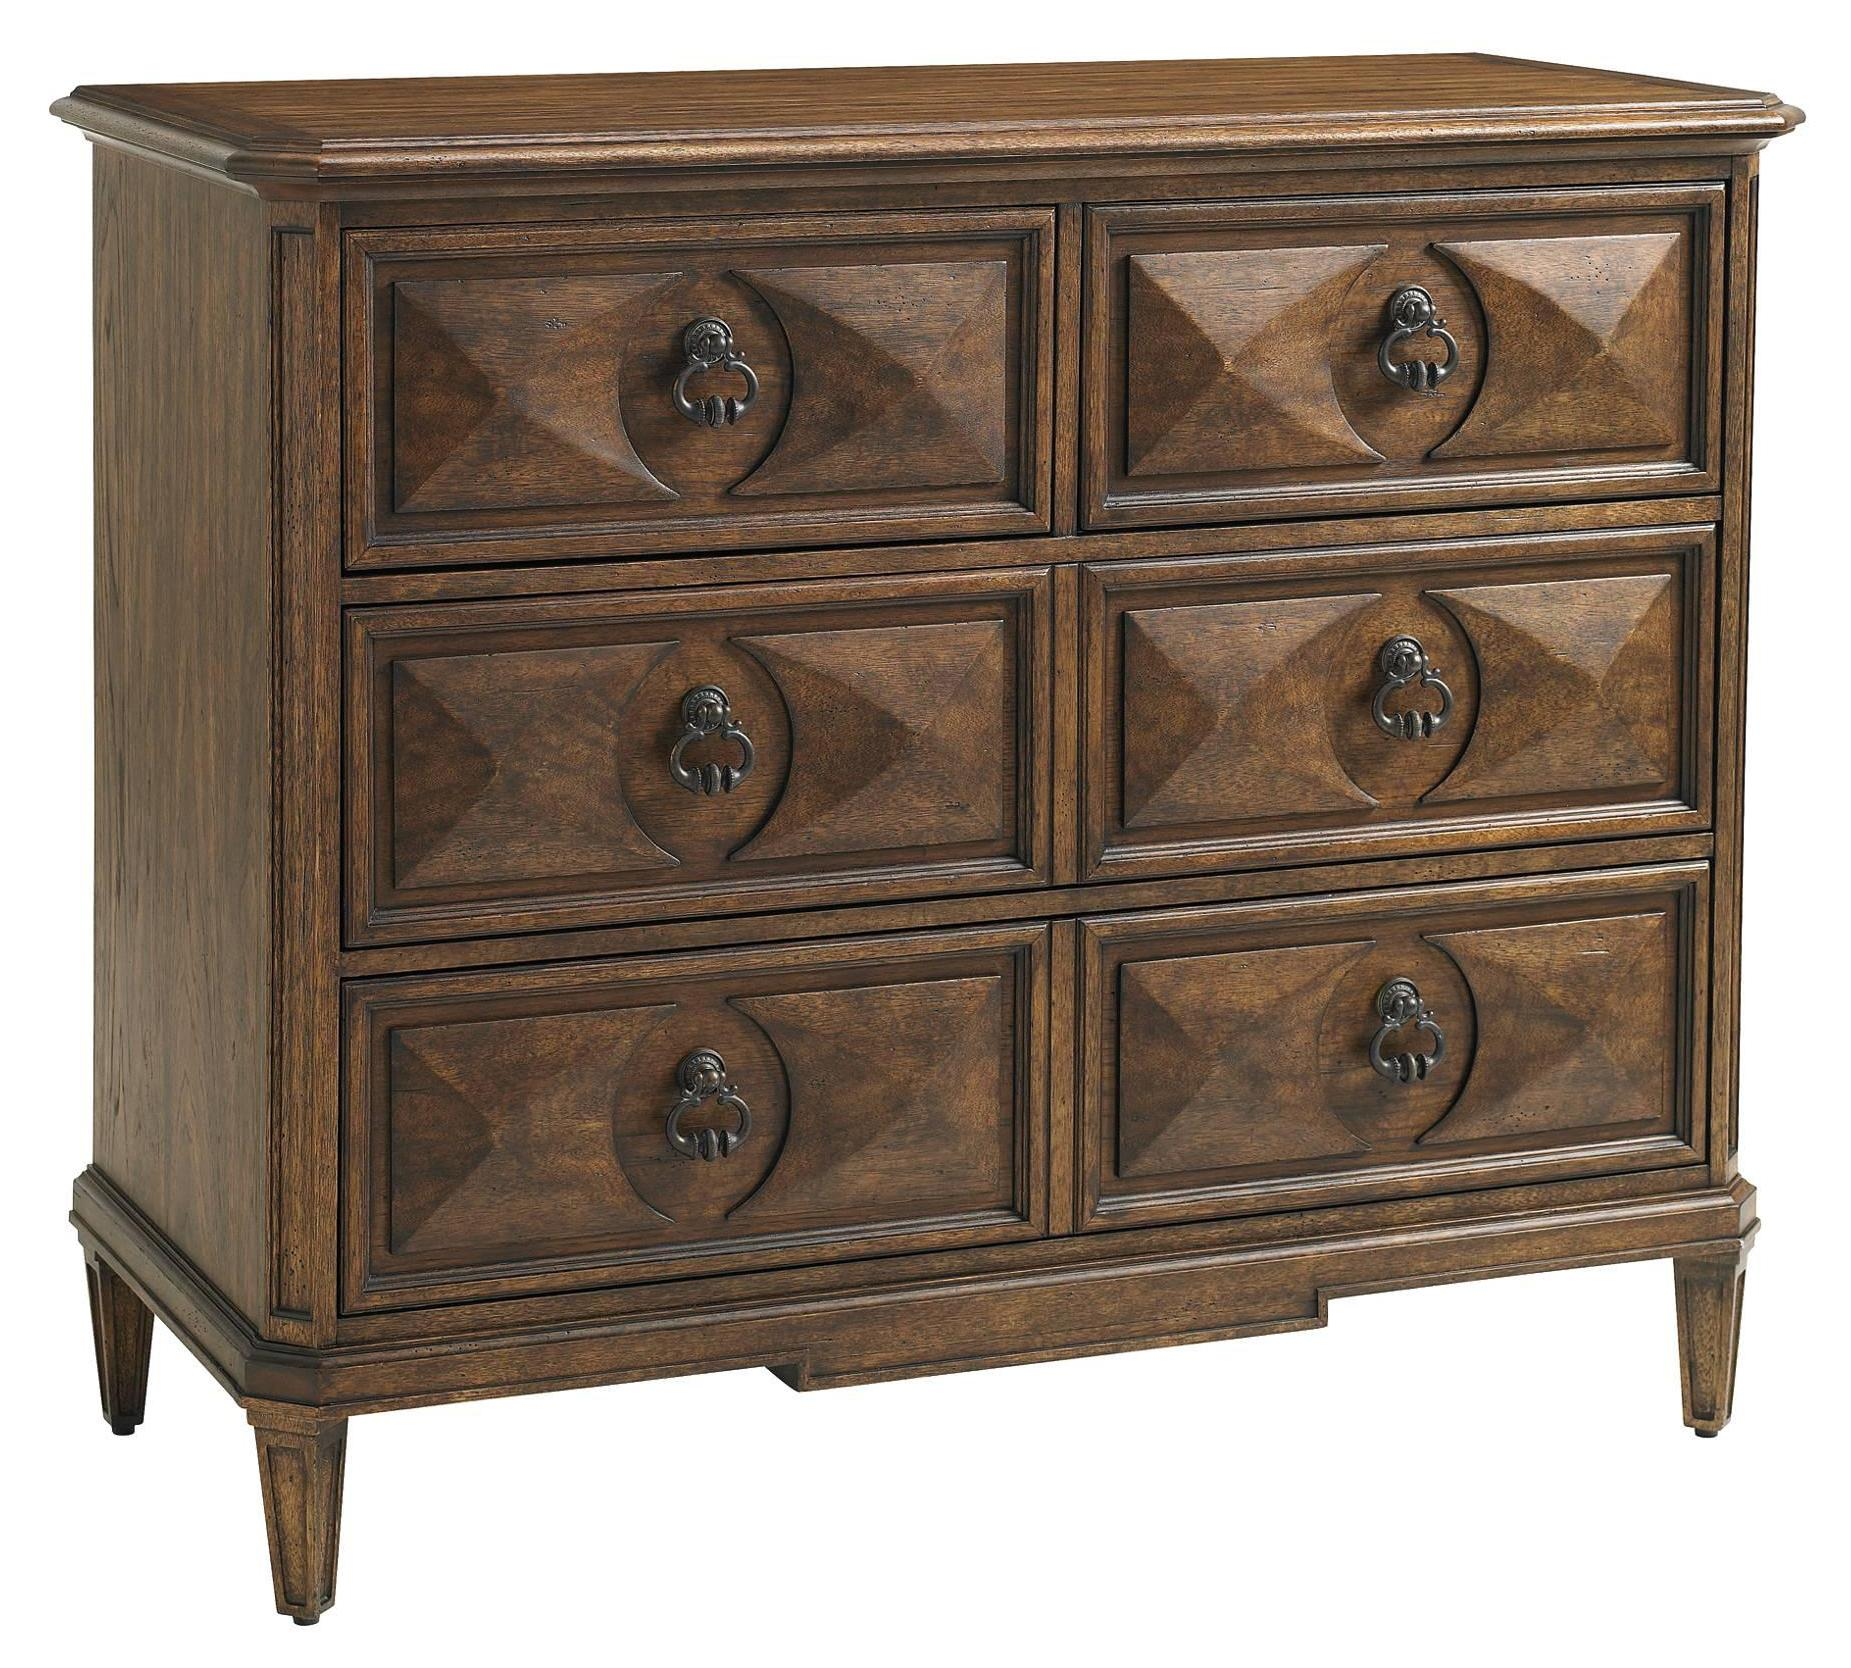 Stanley Furniture Villa Fiora Media Chest - Item Number: 391-13-11